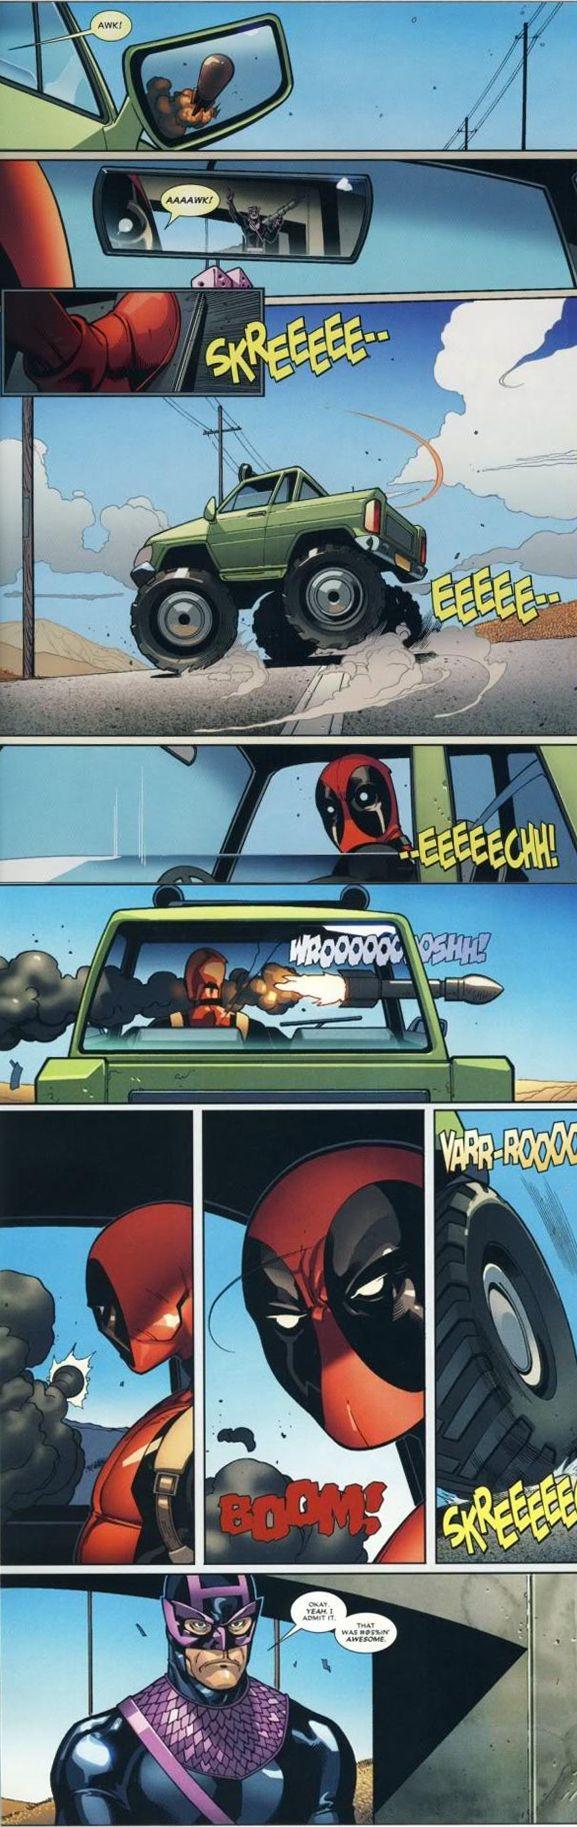 Deadpool and Bullseye. That is pretty impressive